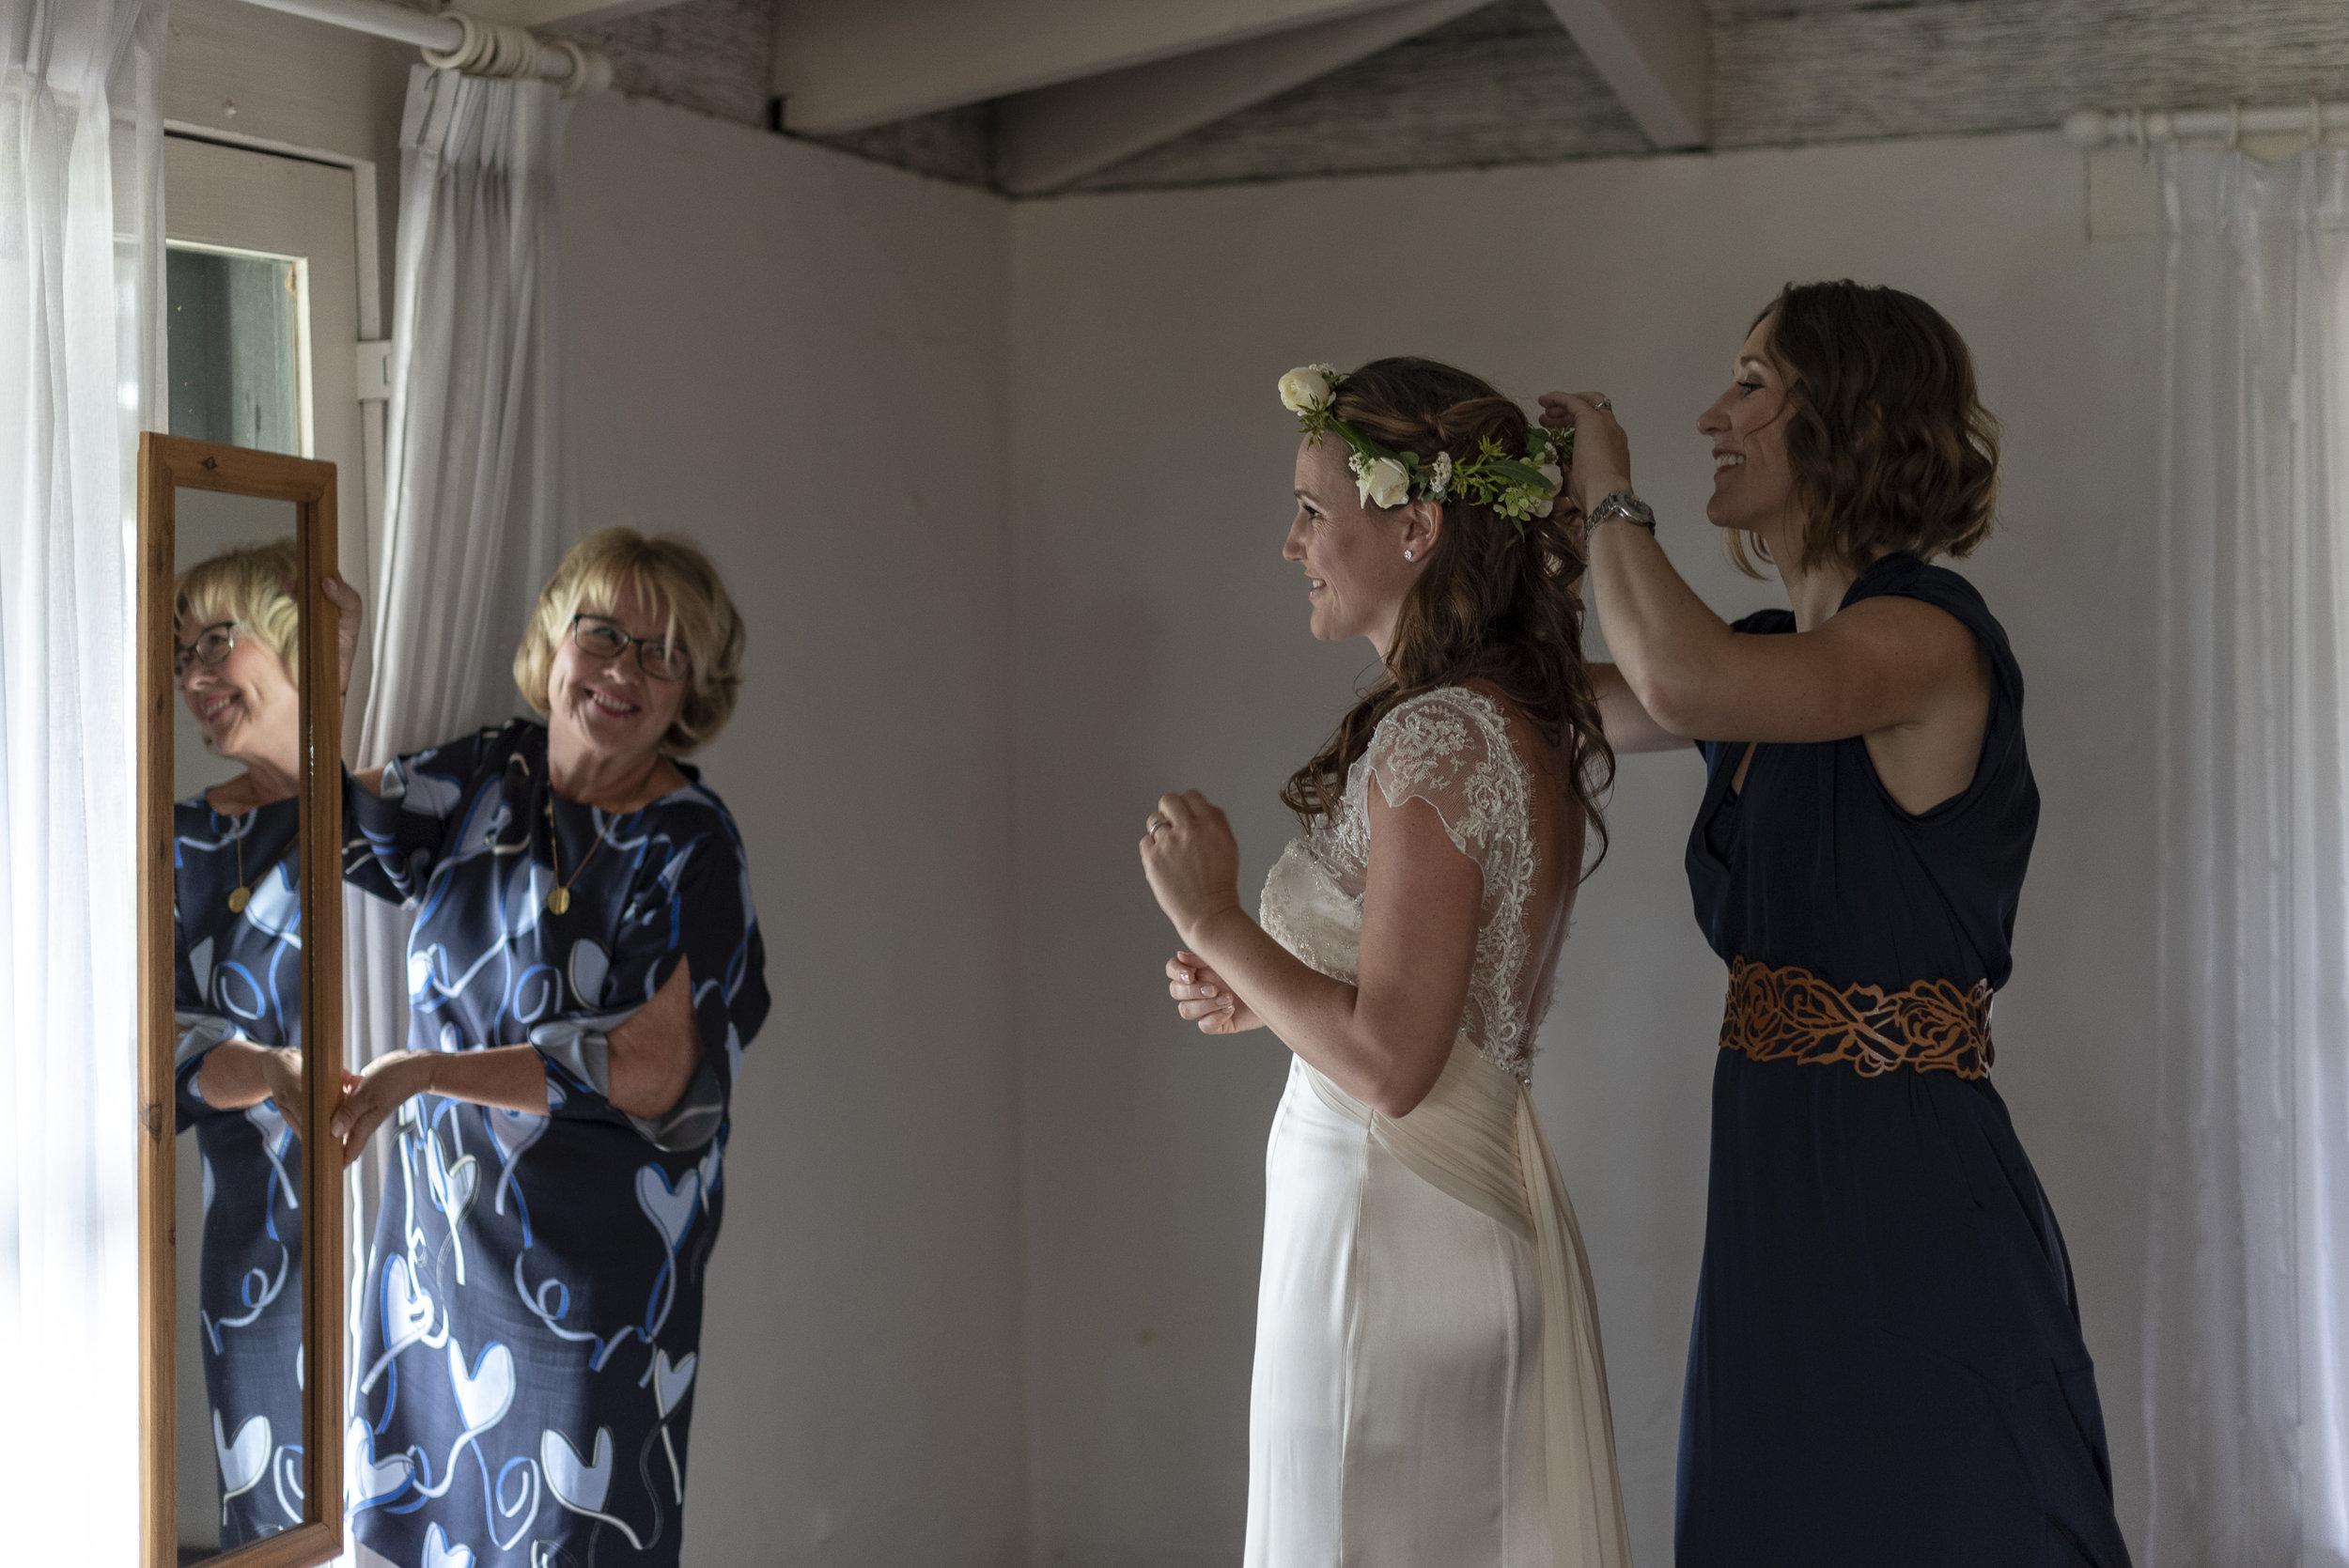 weddings by atelier photography-wedding-10.jpg